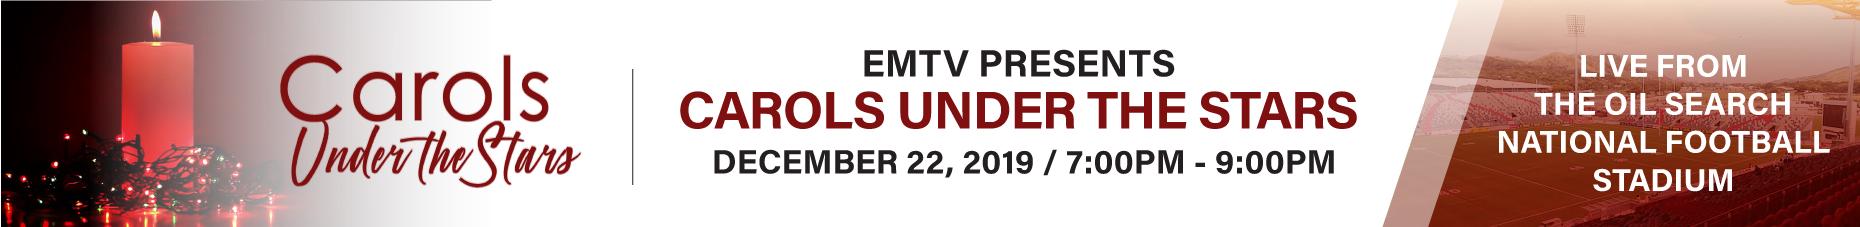 Paita To Address EMTV/NBC Issues – EMTV Online